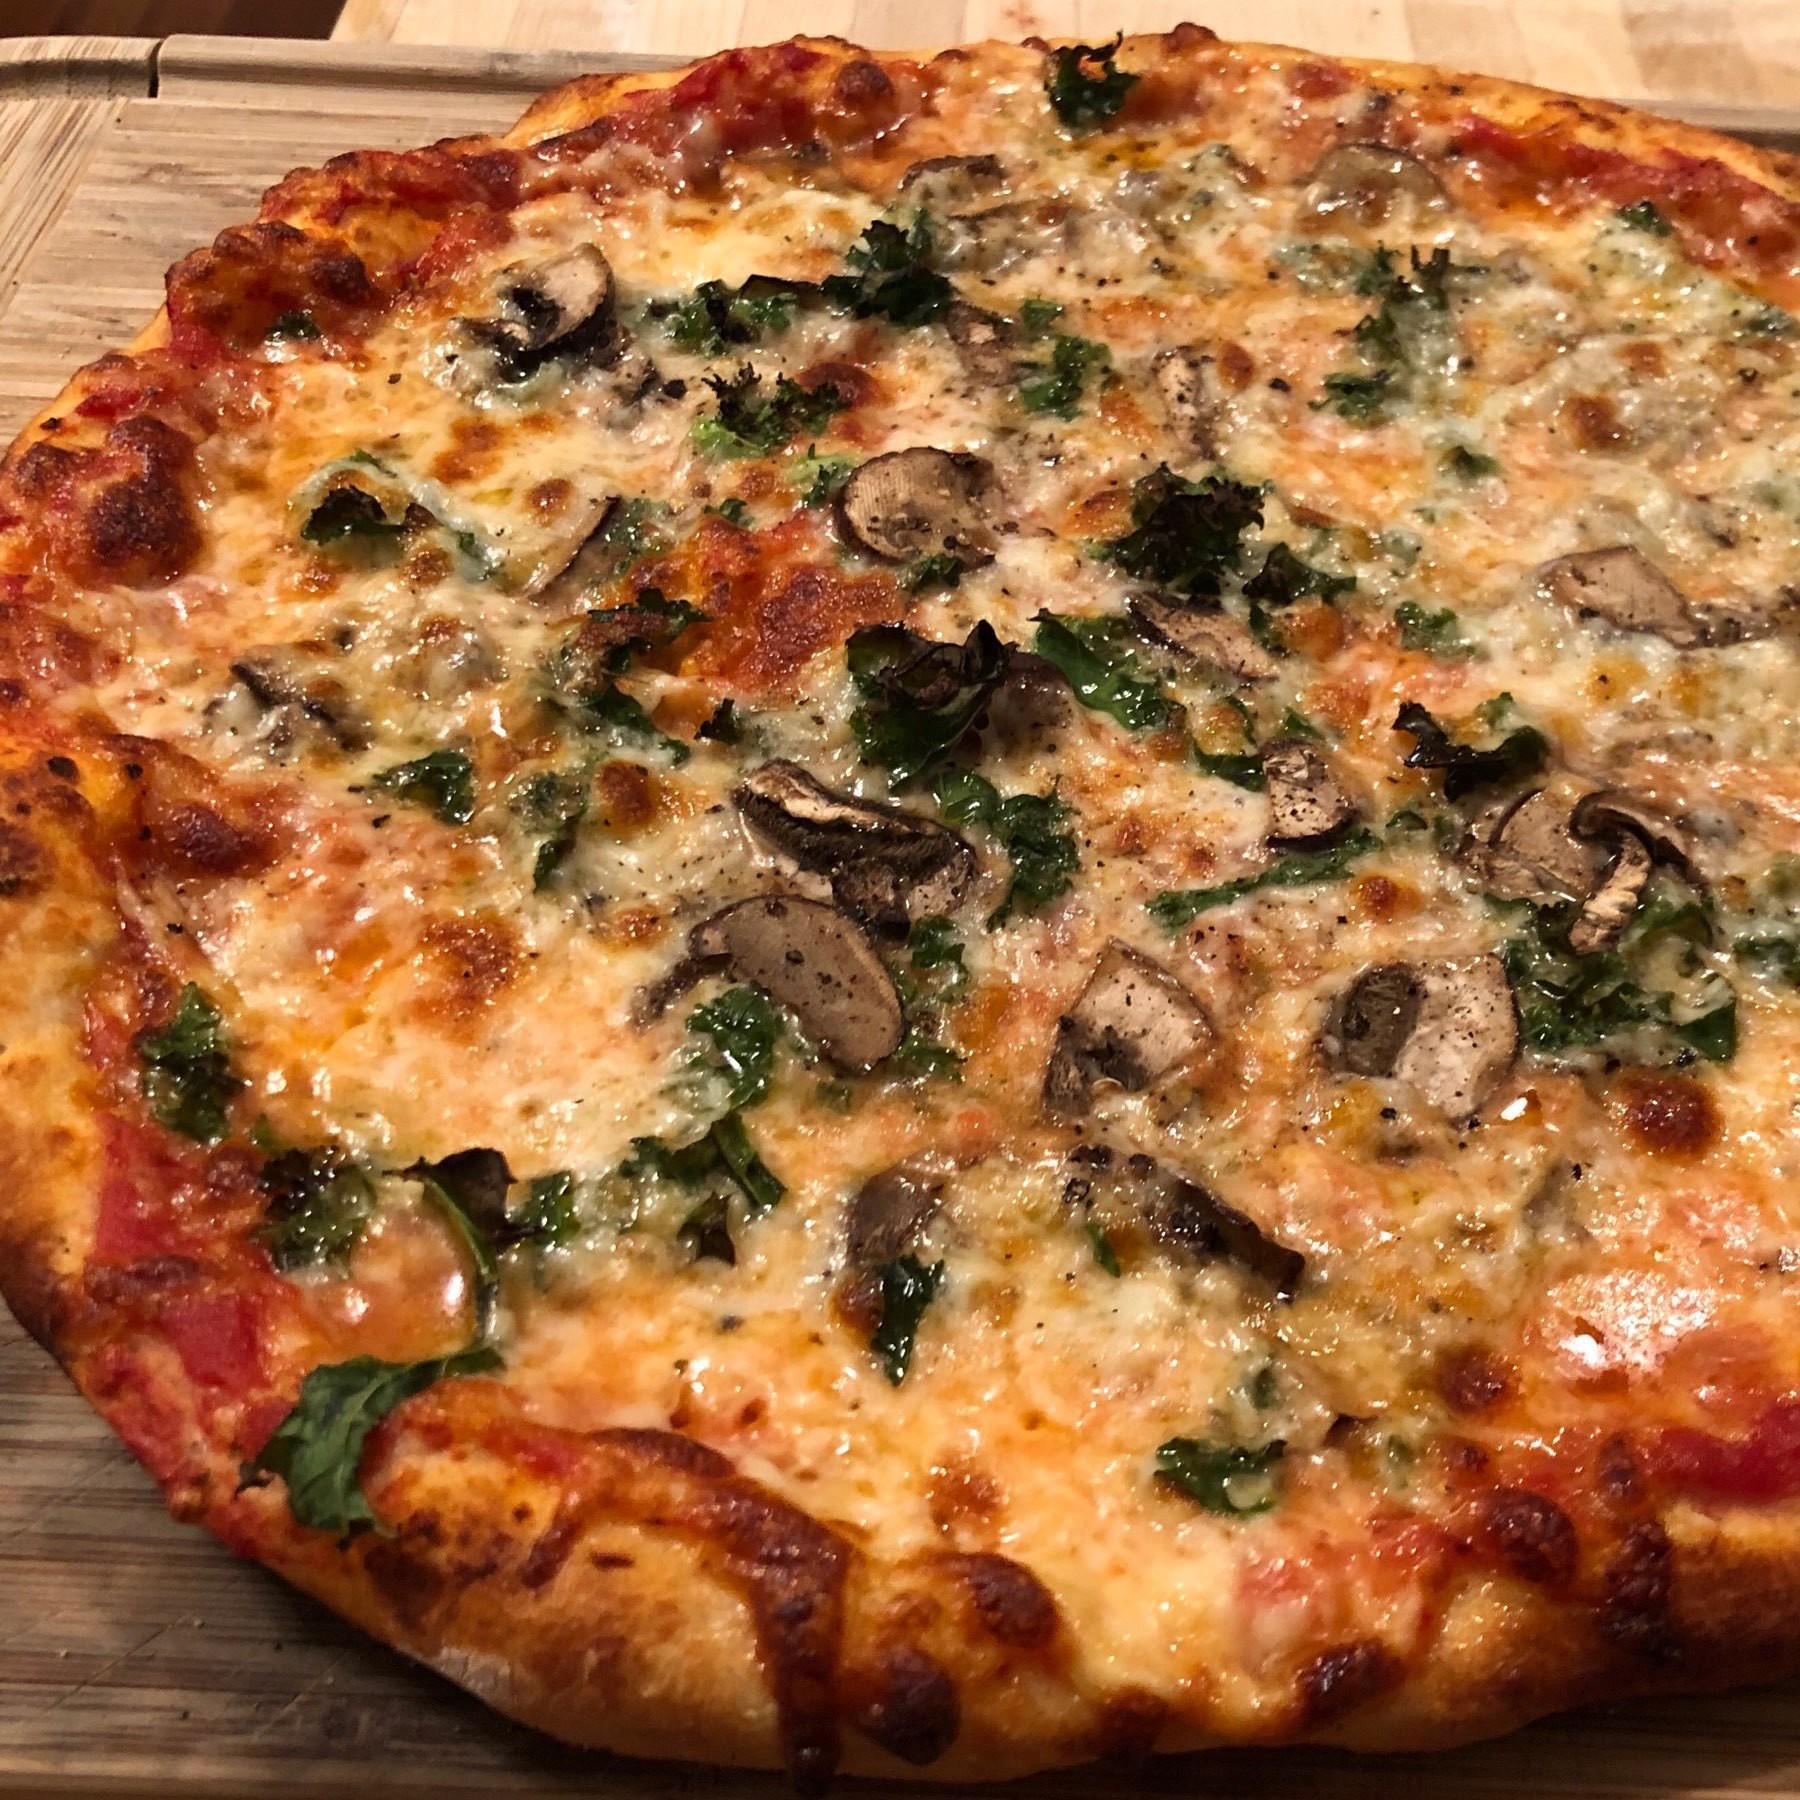 Close up on kale and mushroom pizza.